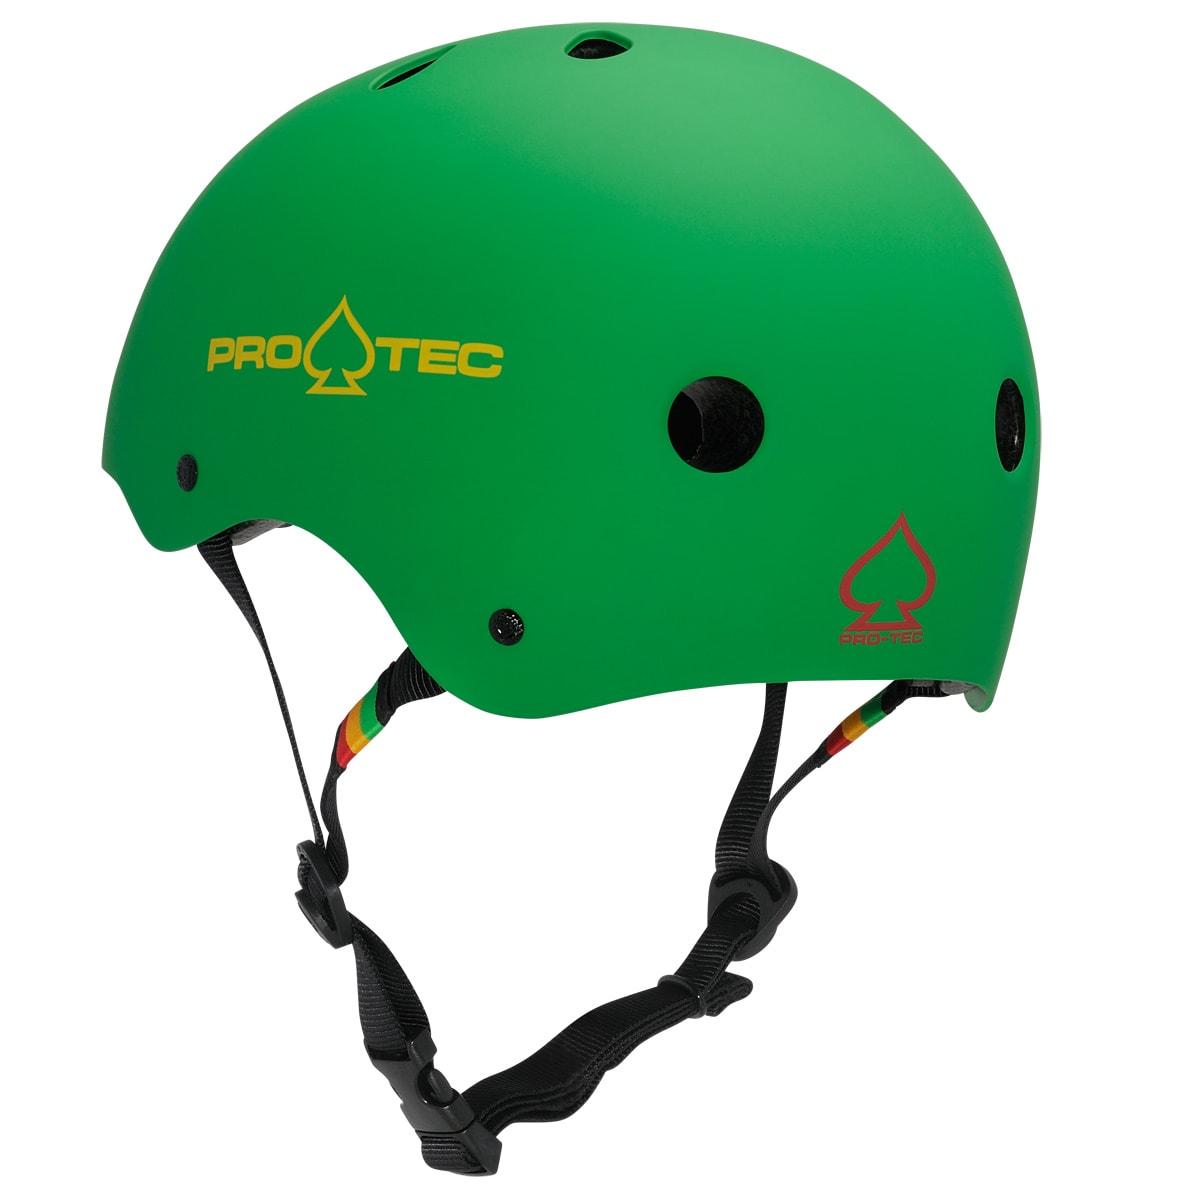 Protec Classic Skateboard Helmet